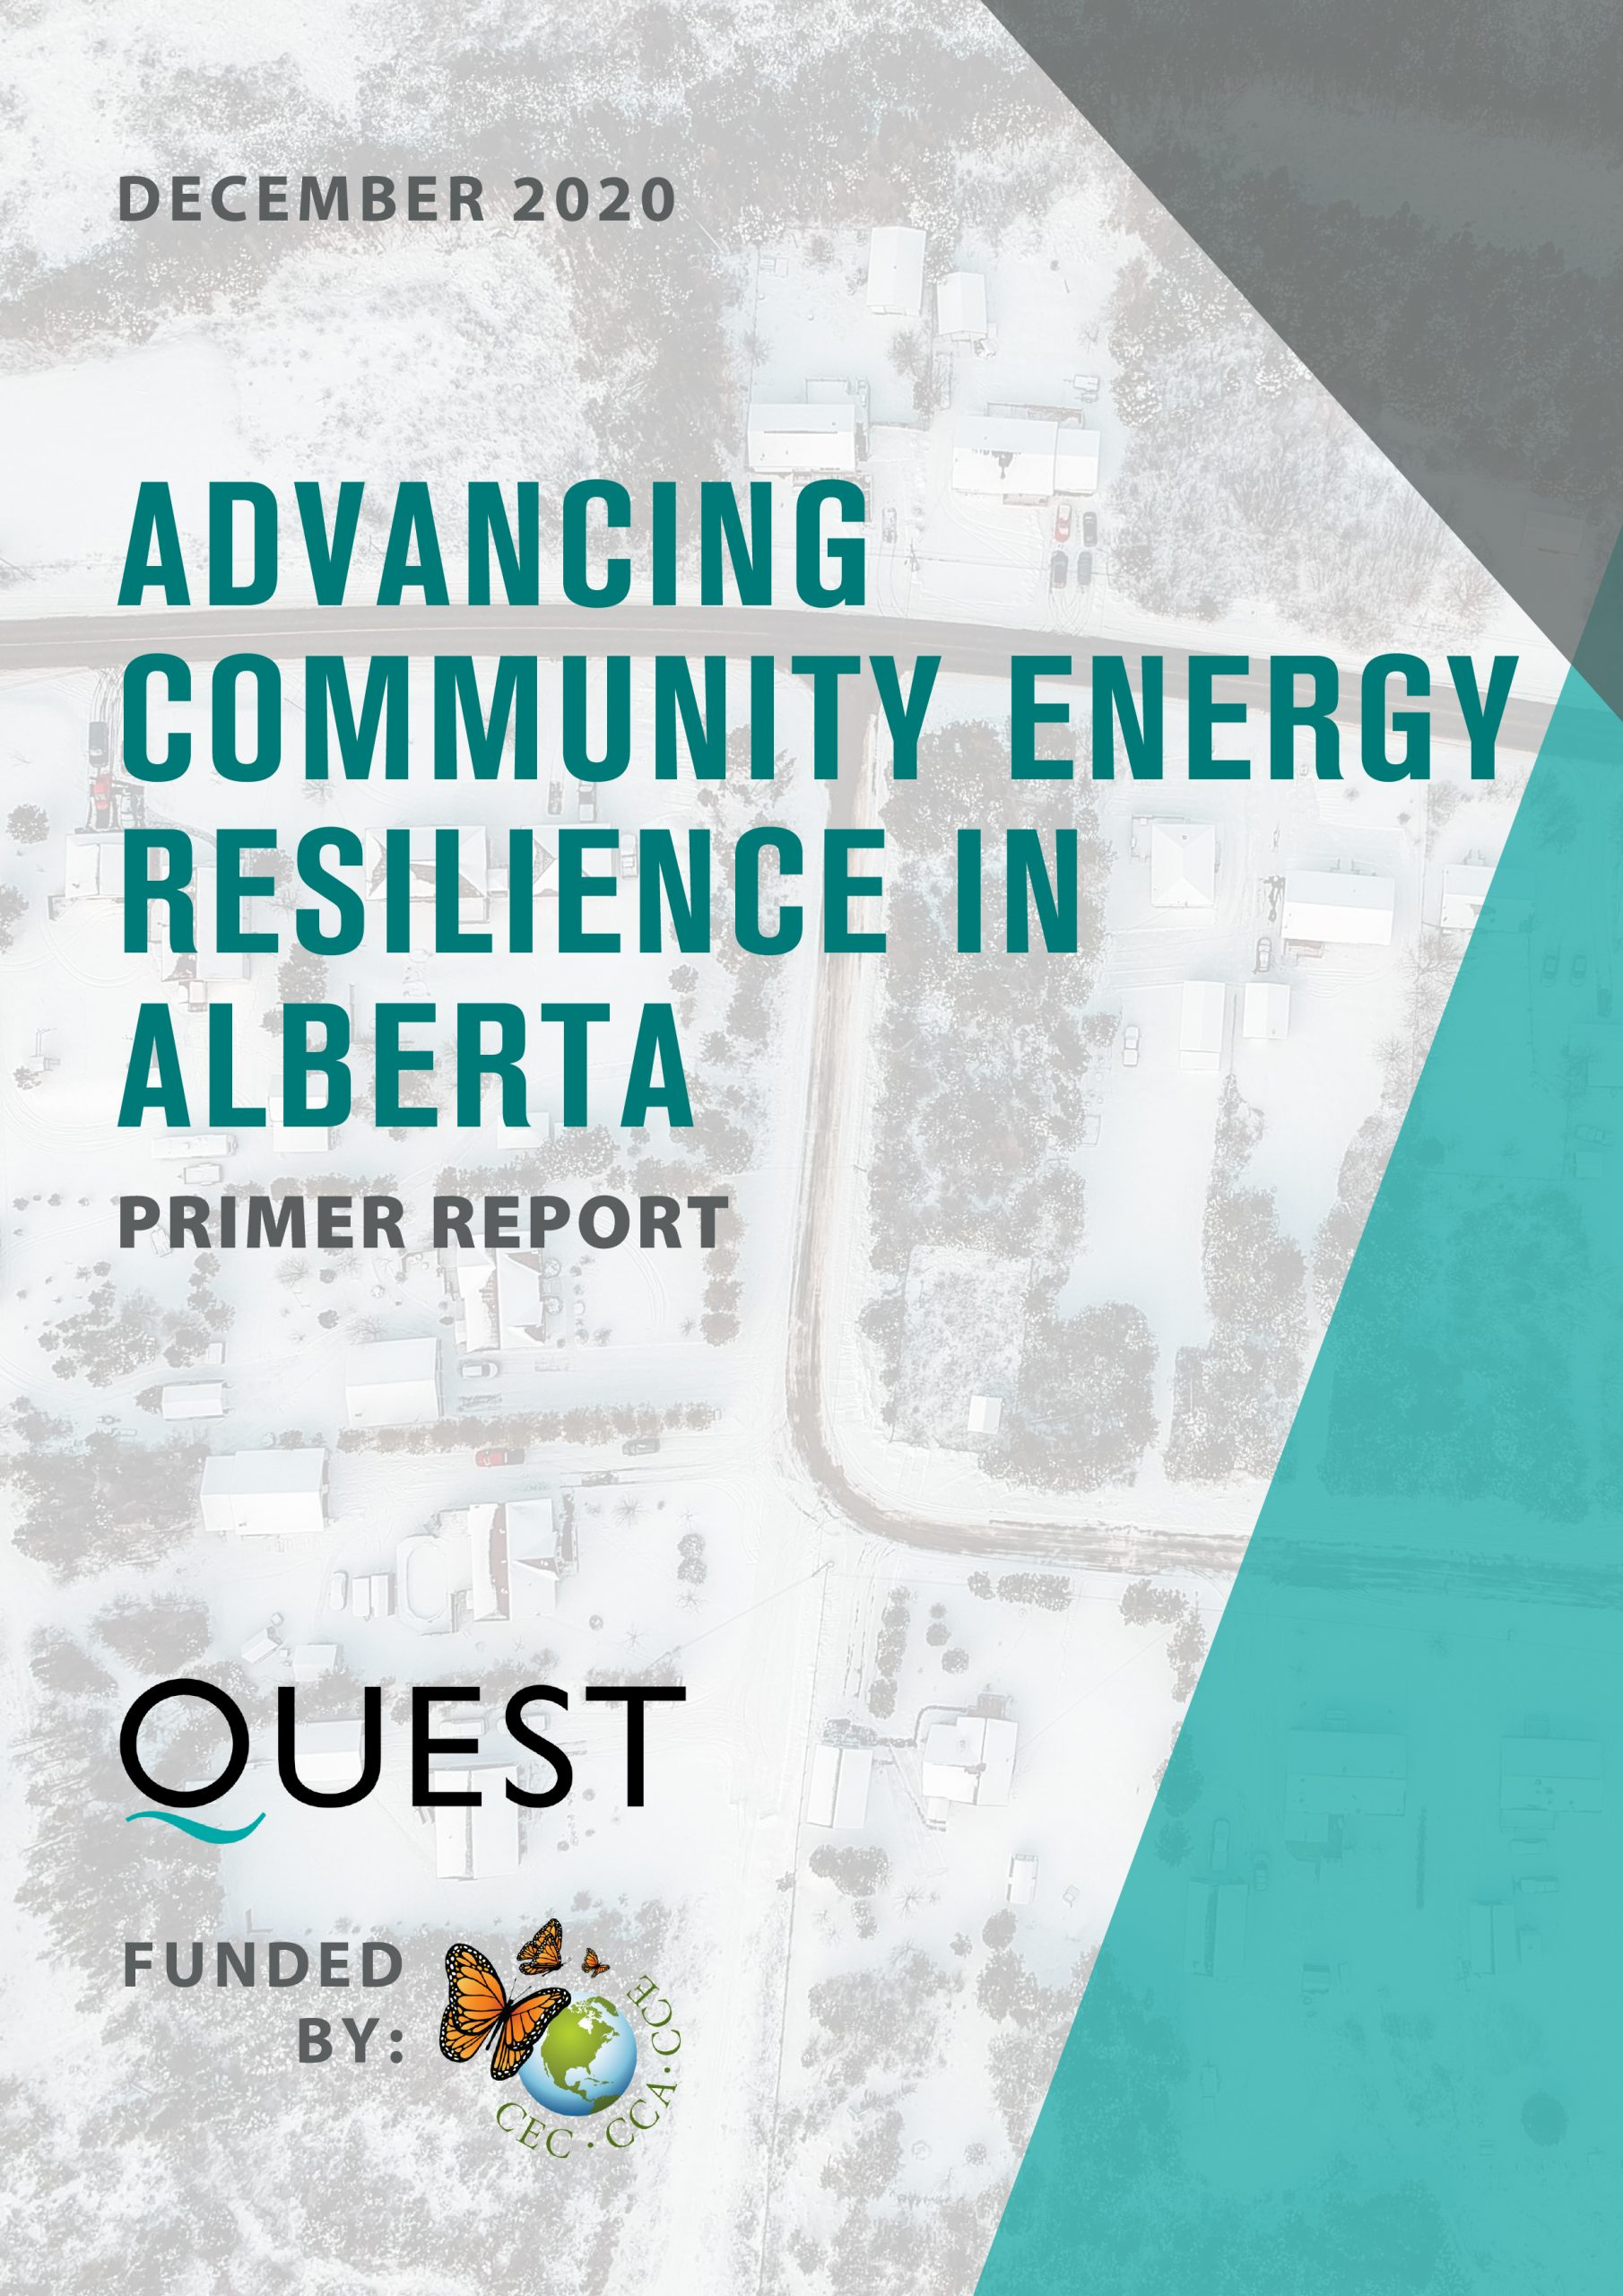 Advancing Community Energy Resilience in Alberta - Primer report